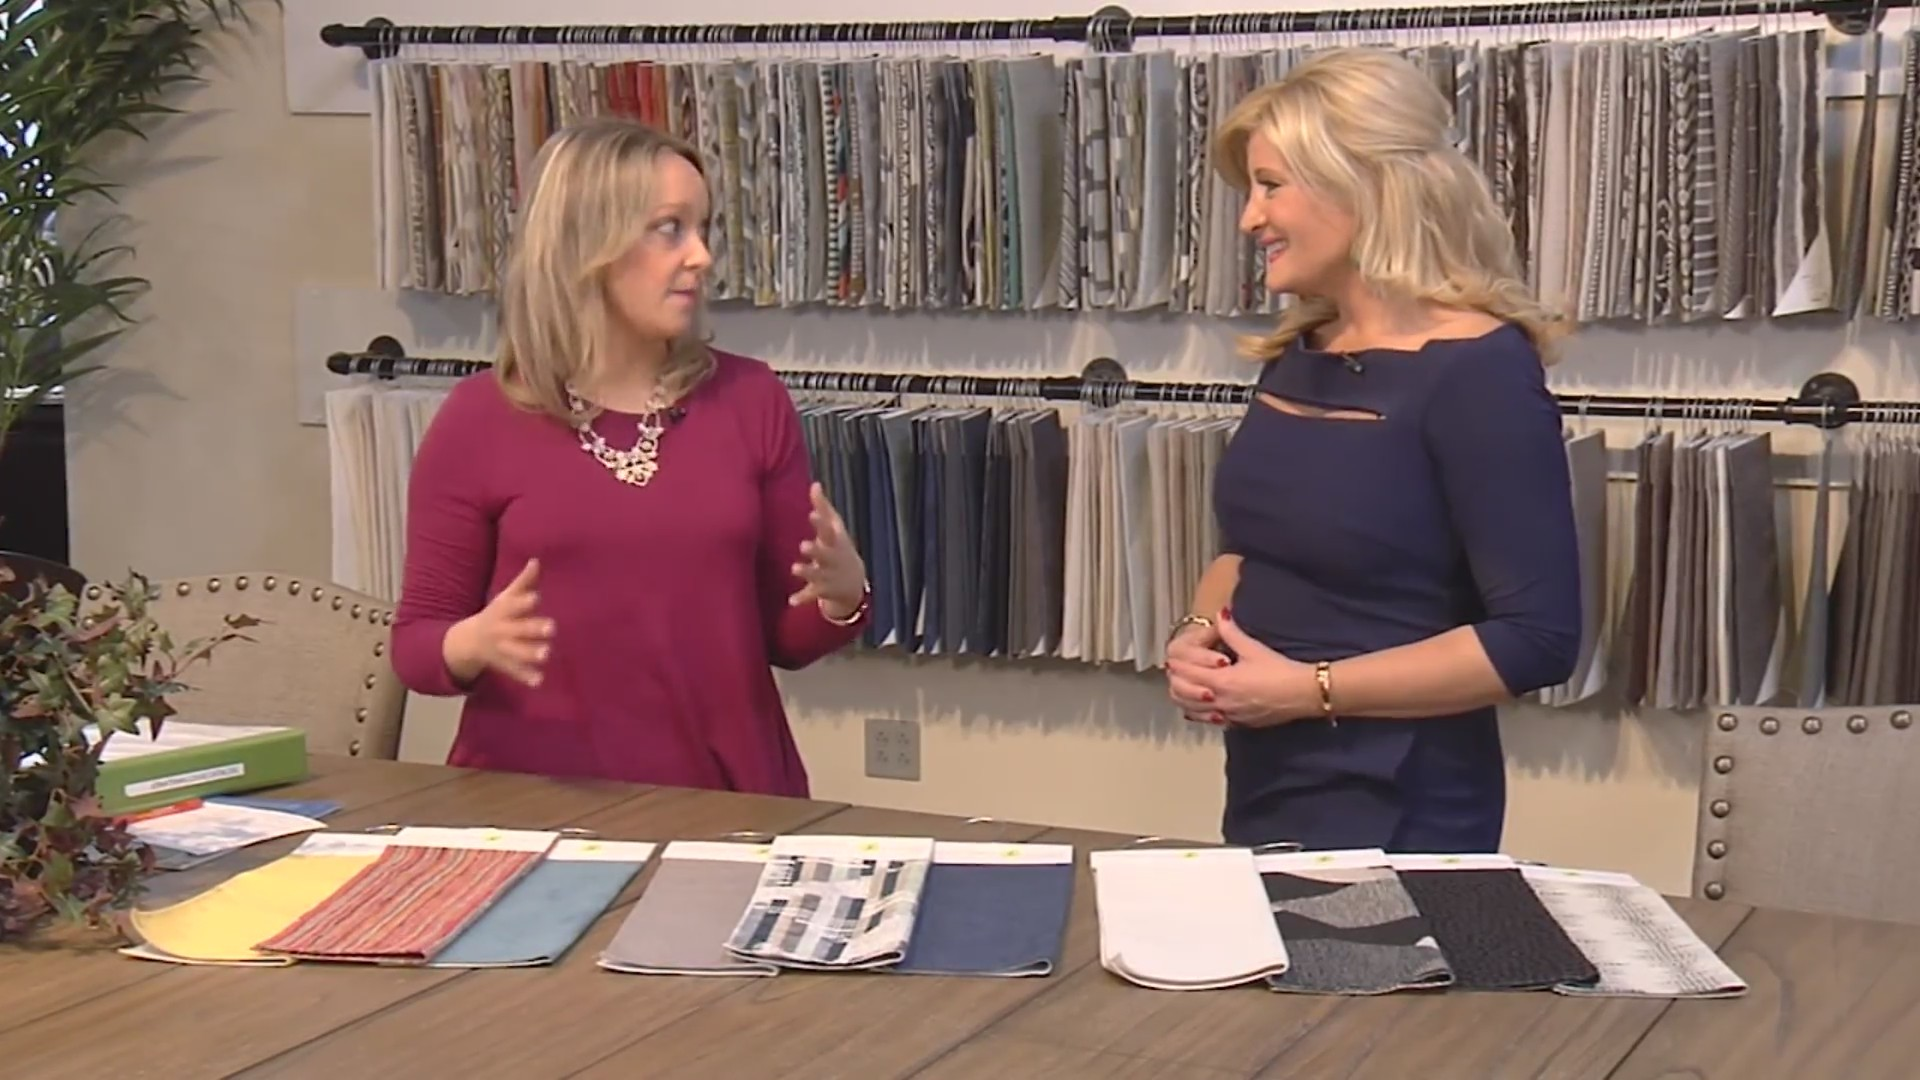 Knoxville Wholesale Furniture fabrics